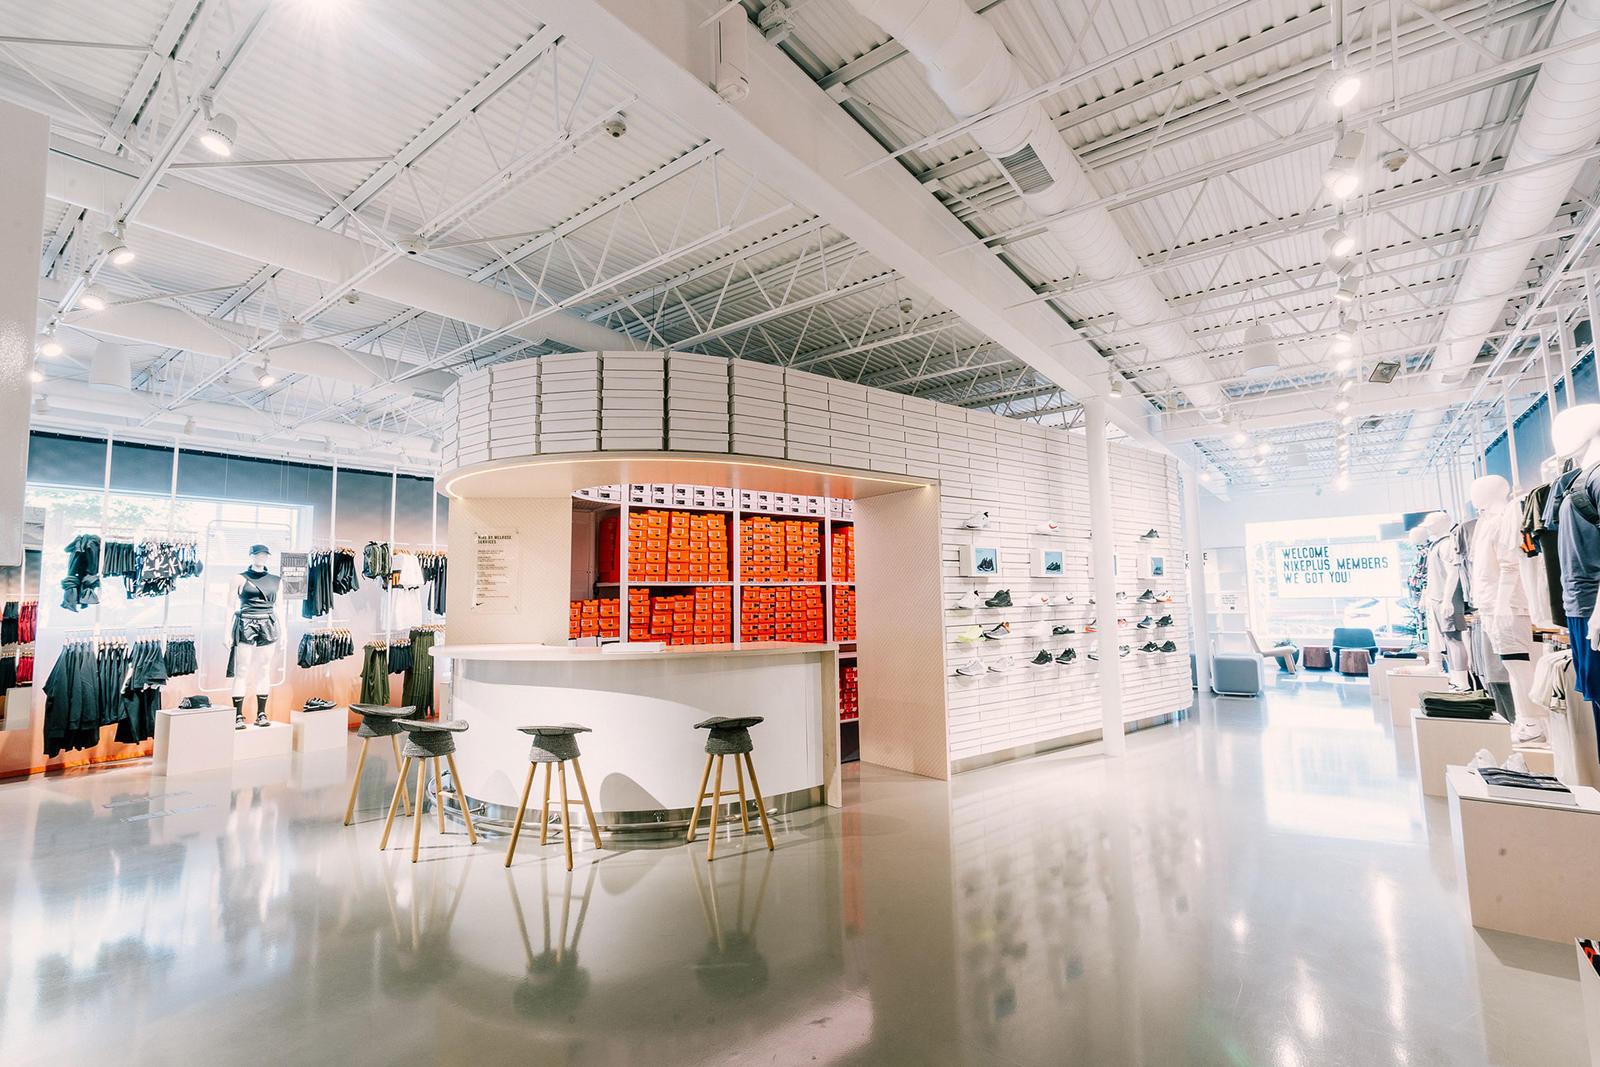 Gaviota testigo Si  New Nike Live Concept Store Unites Digital and Physical Retail - Fashion  Trendsetter